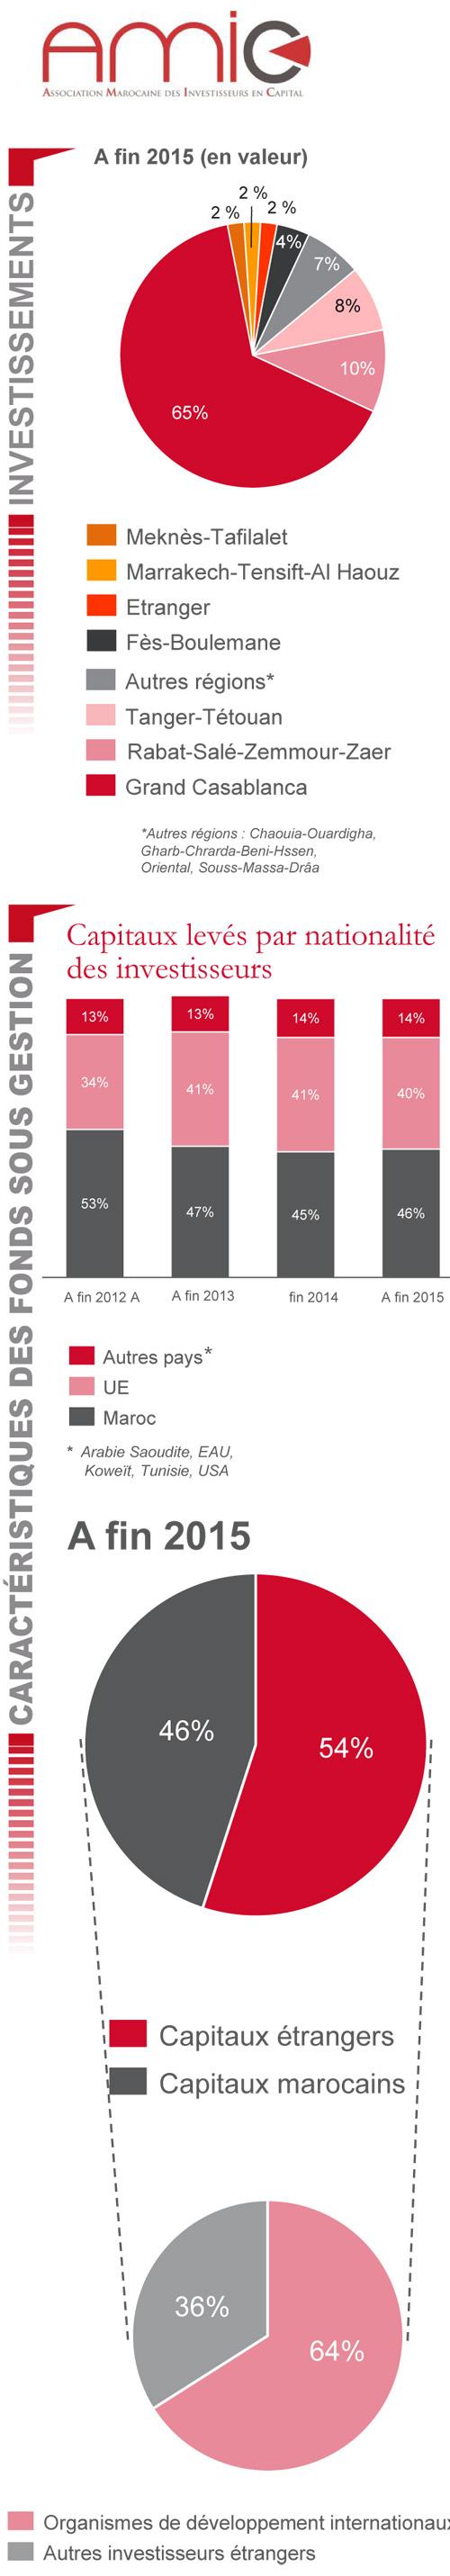 AMIC-investissements-Maroc